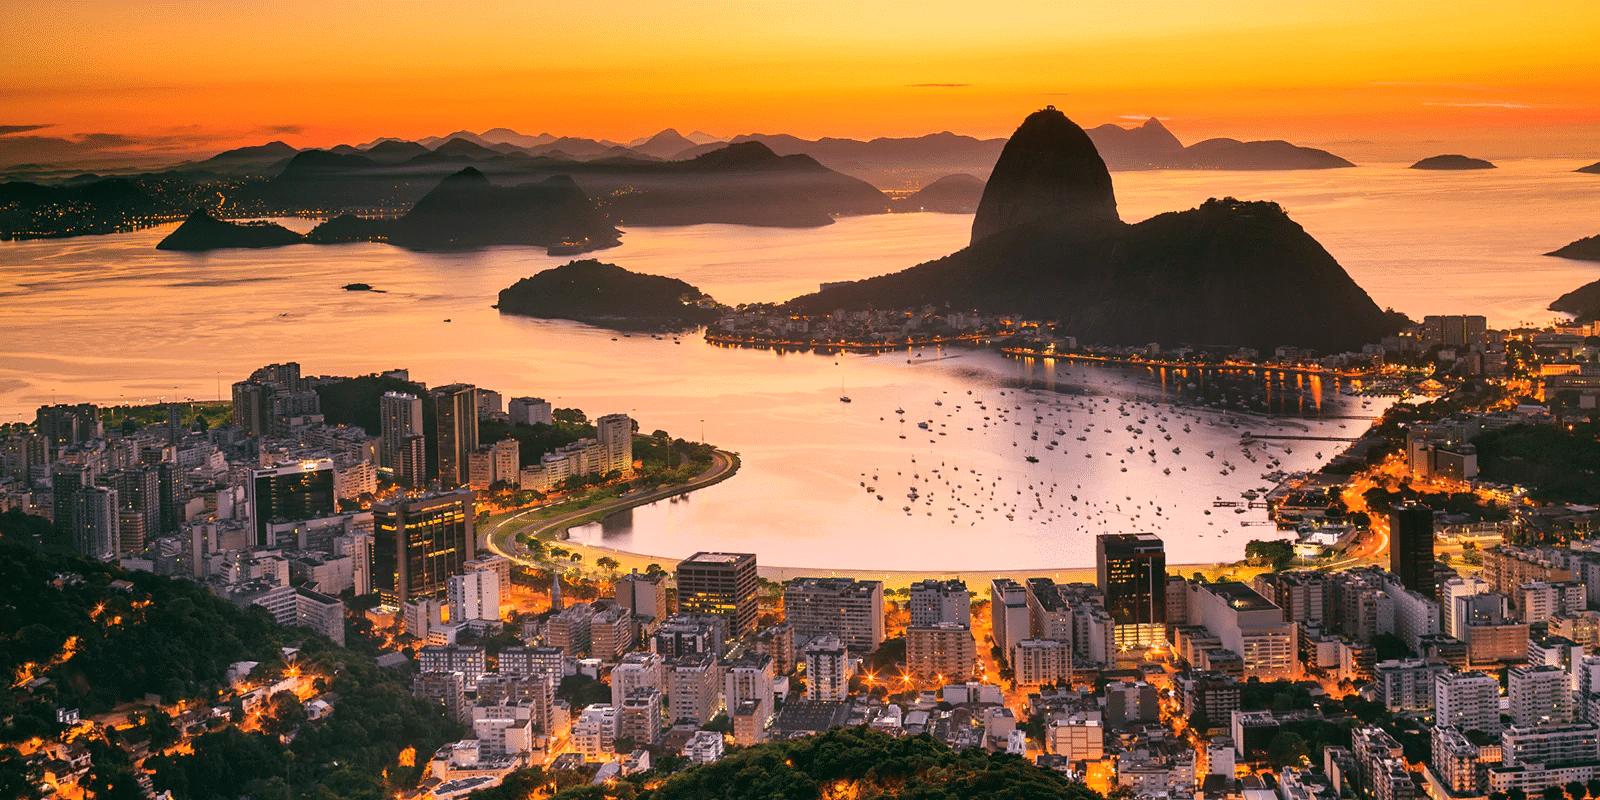 Rio de Janeiro Brazil - where is it hot in December